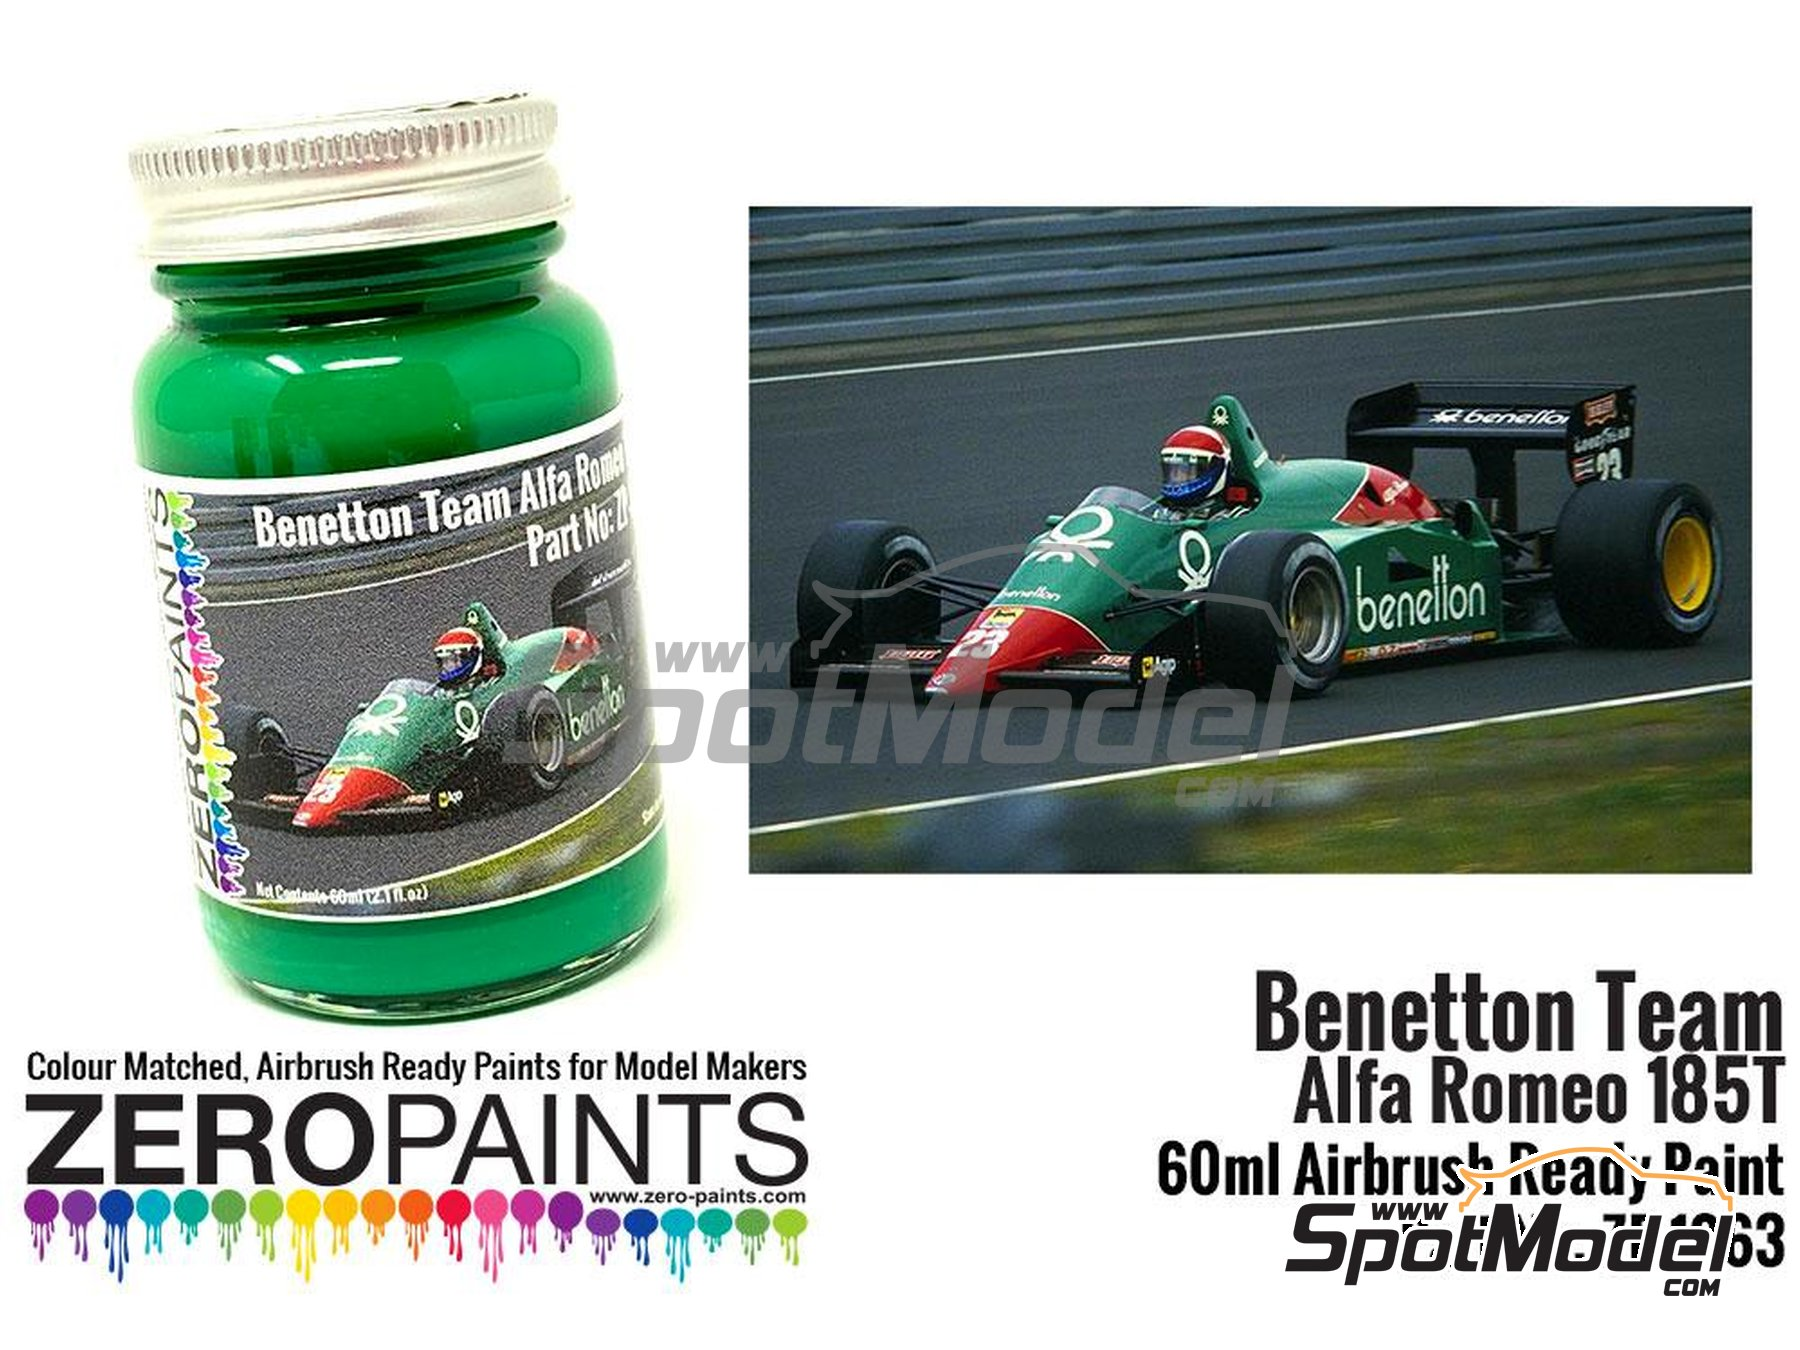 Image 1: Verde Benetton - Benetton Team Alfa Romeo 185T Green United Colors of Benetton - 1 x 60ml | Pintura fabricado por Zero Paints (ref.ZP-1263)